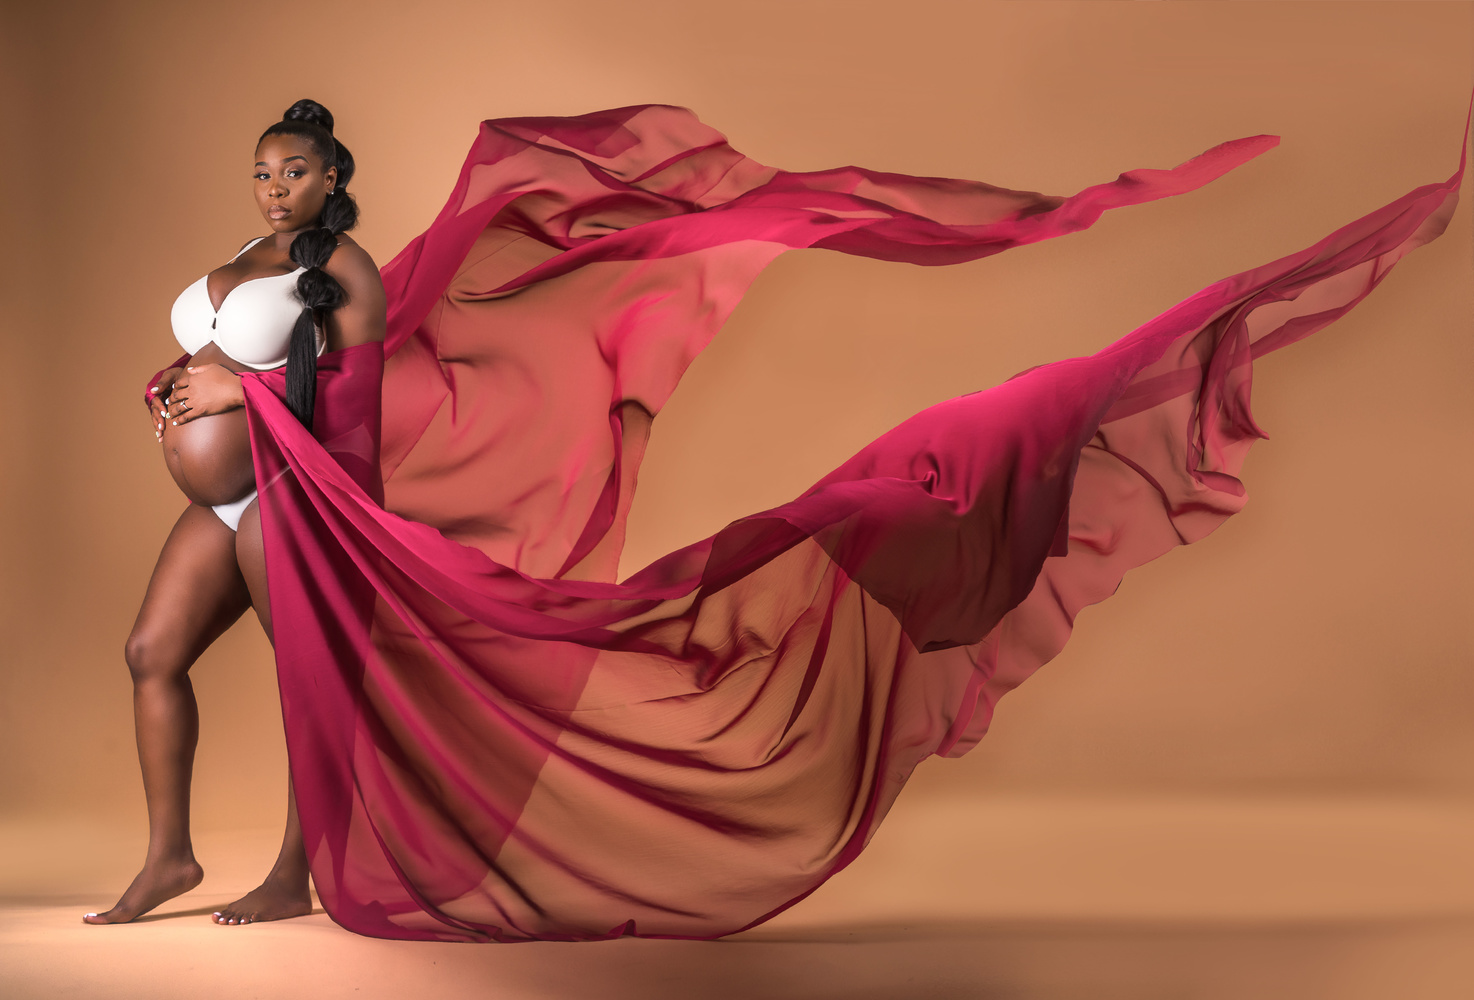 Ashana's Flow by Derrick Dean